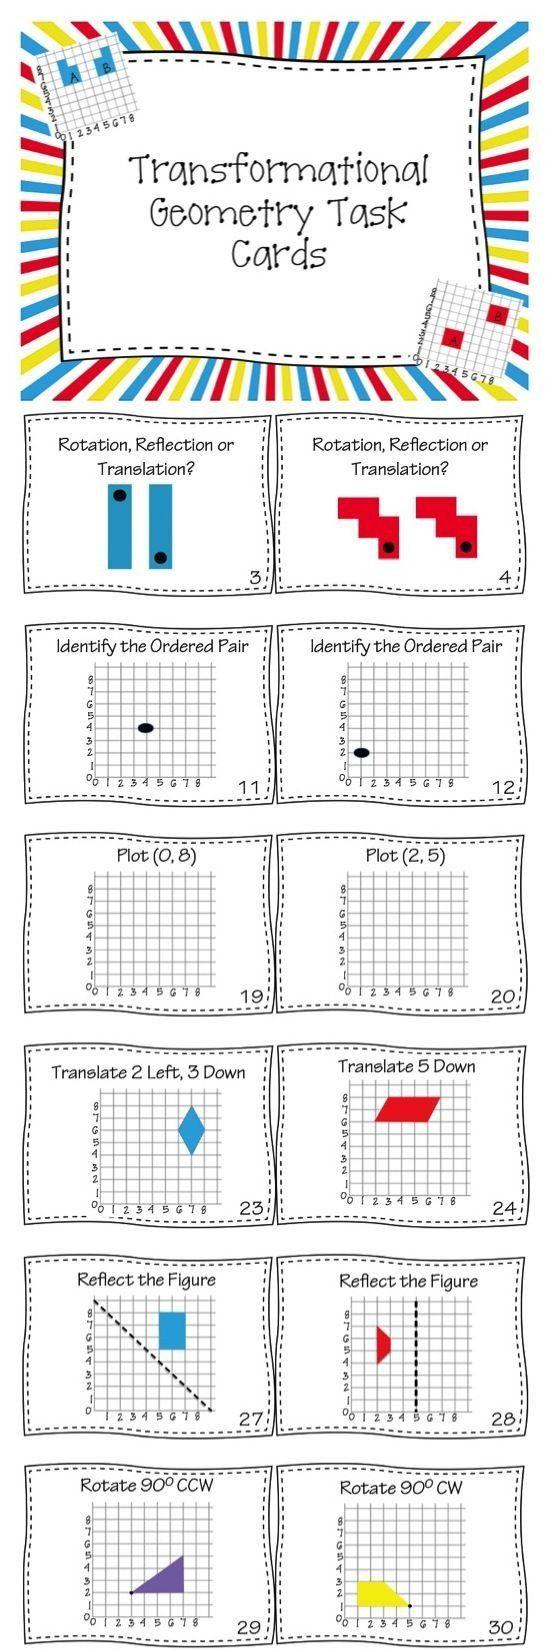 https://cute766.info/32-rotations-worksheet-8th-grade-notutahituq-worksheet-information/ [ 91 x 1651 Pixel ]